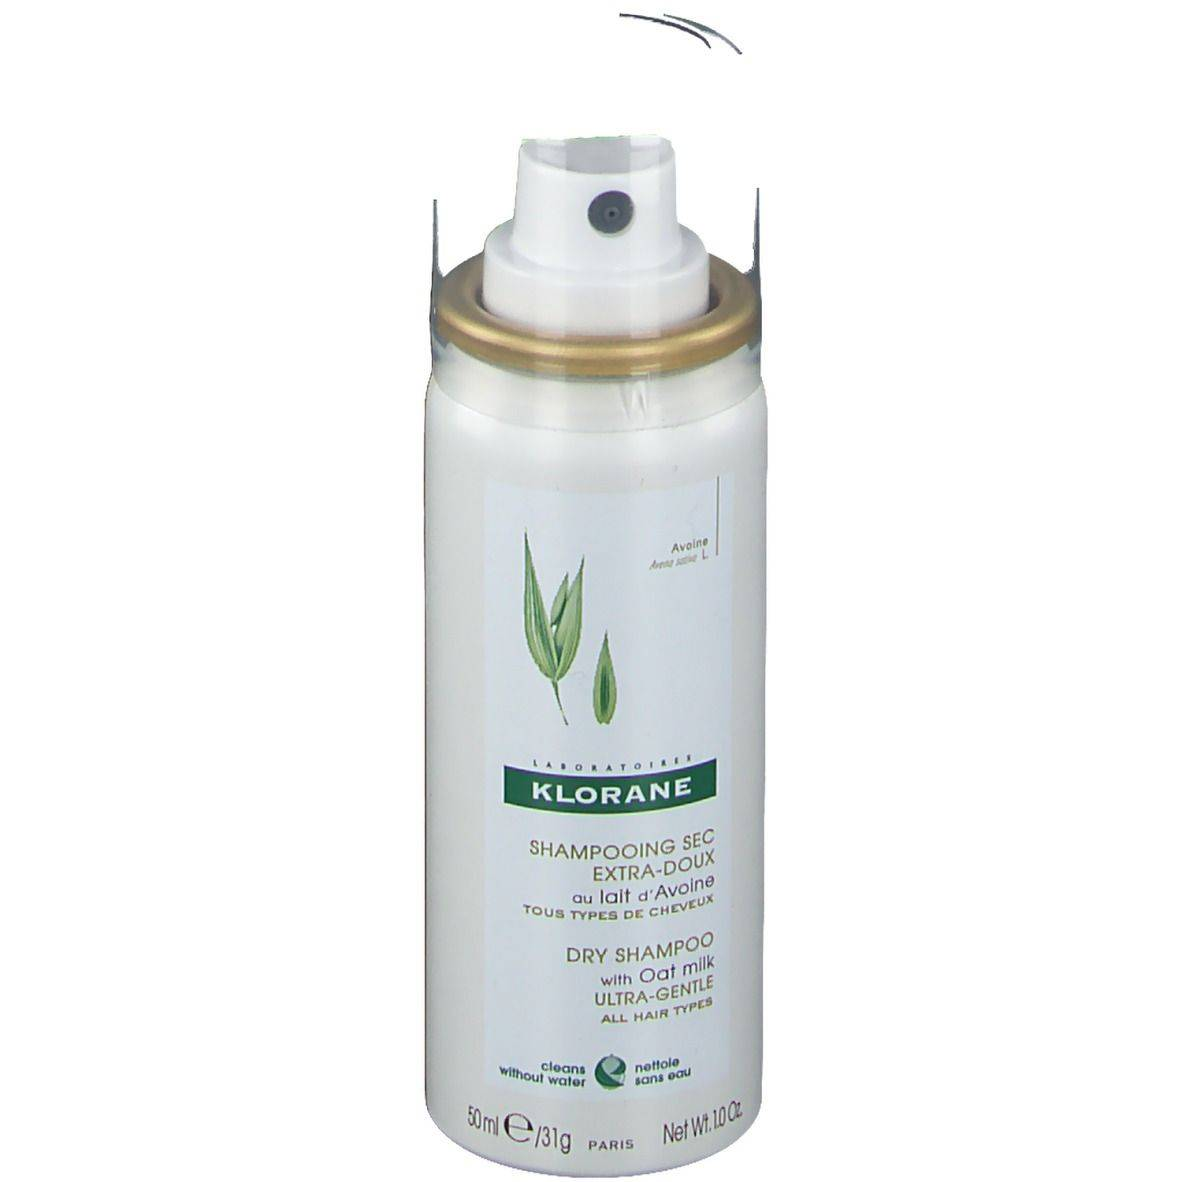 KLORANE Shampooing sec EXTRA-DOUX au lait d'Avoine ml spray